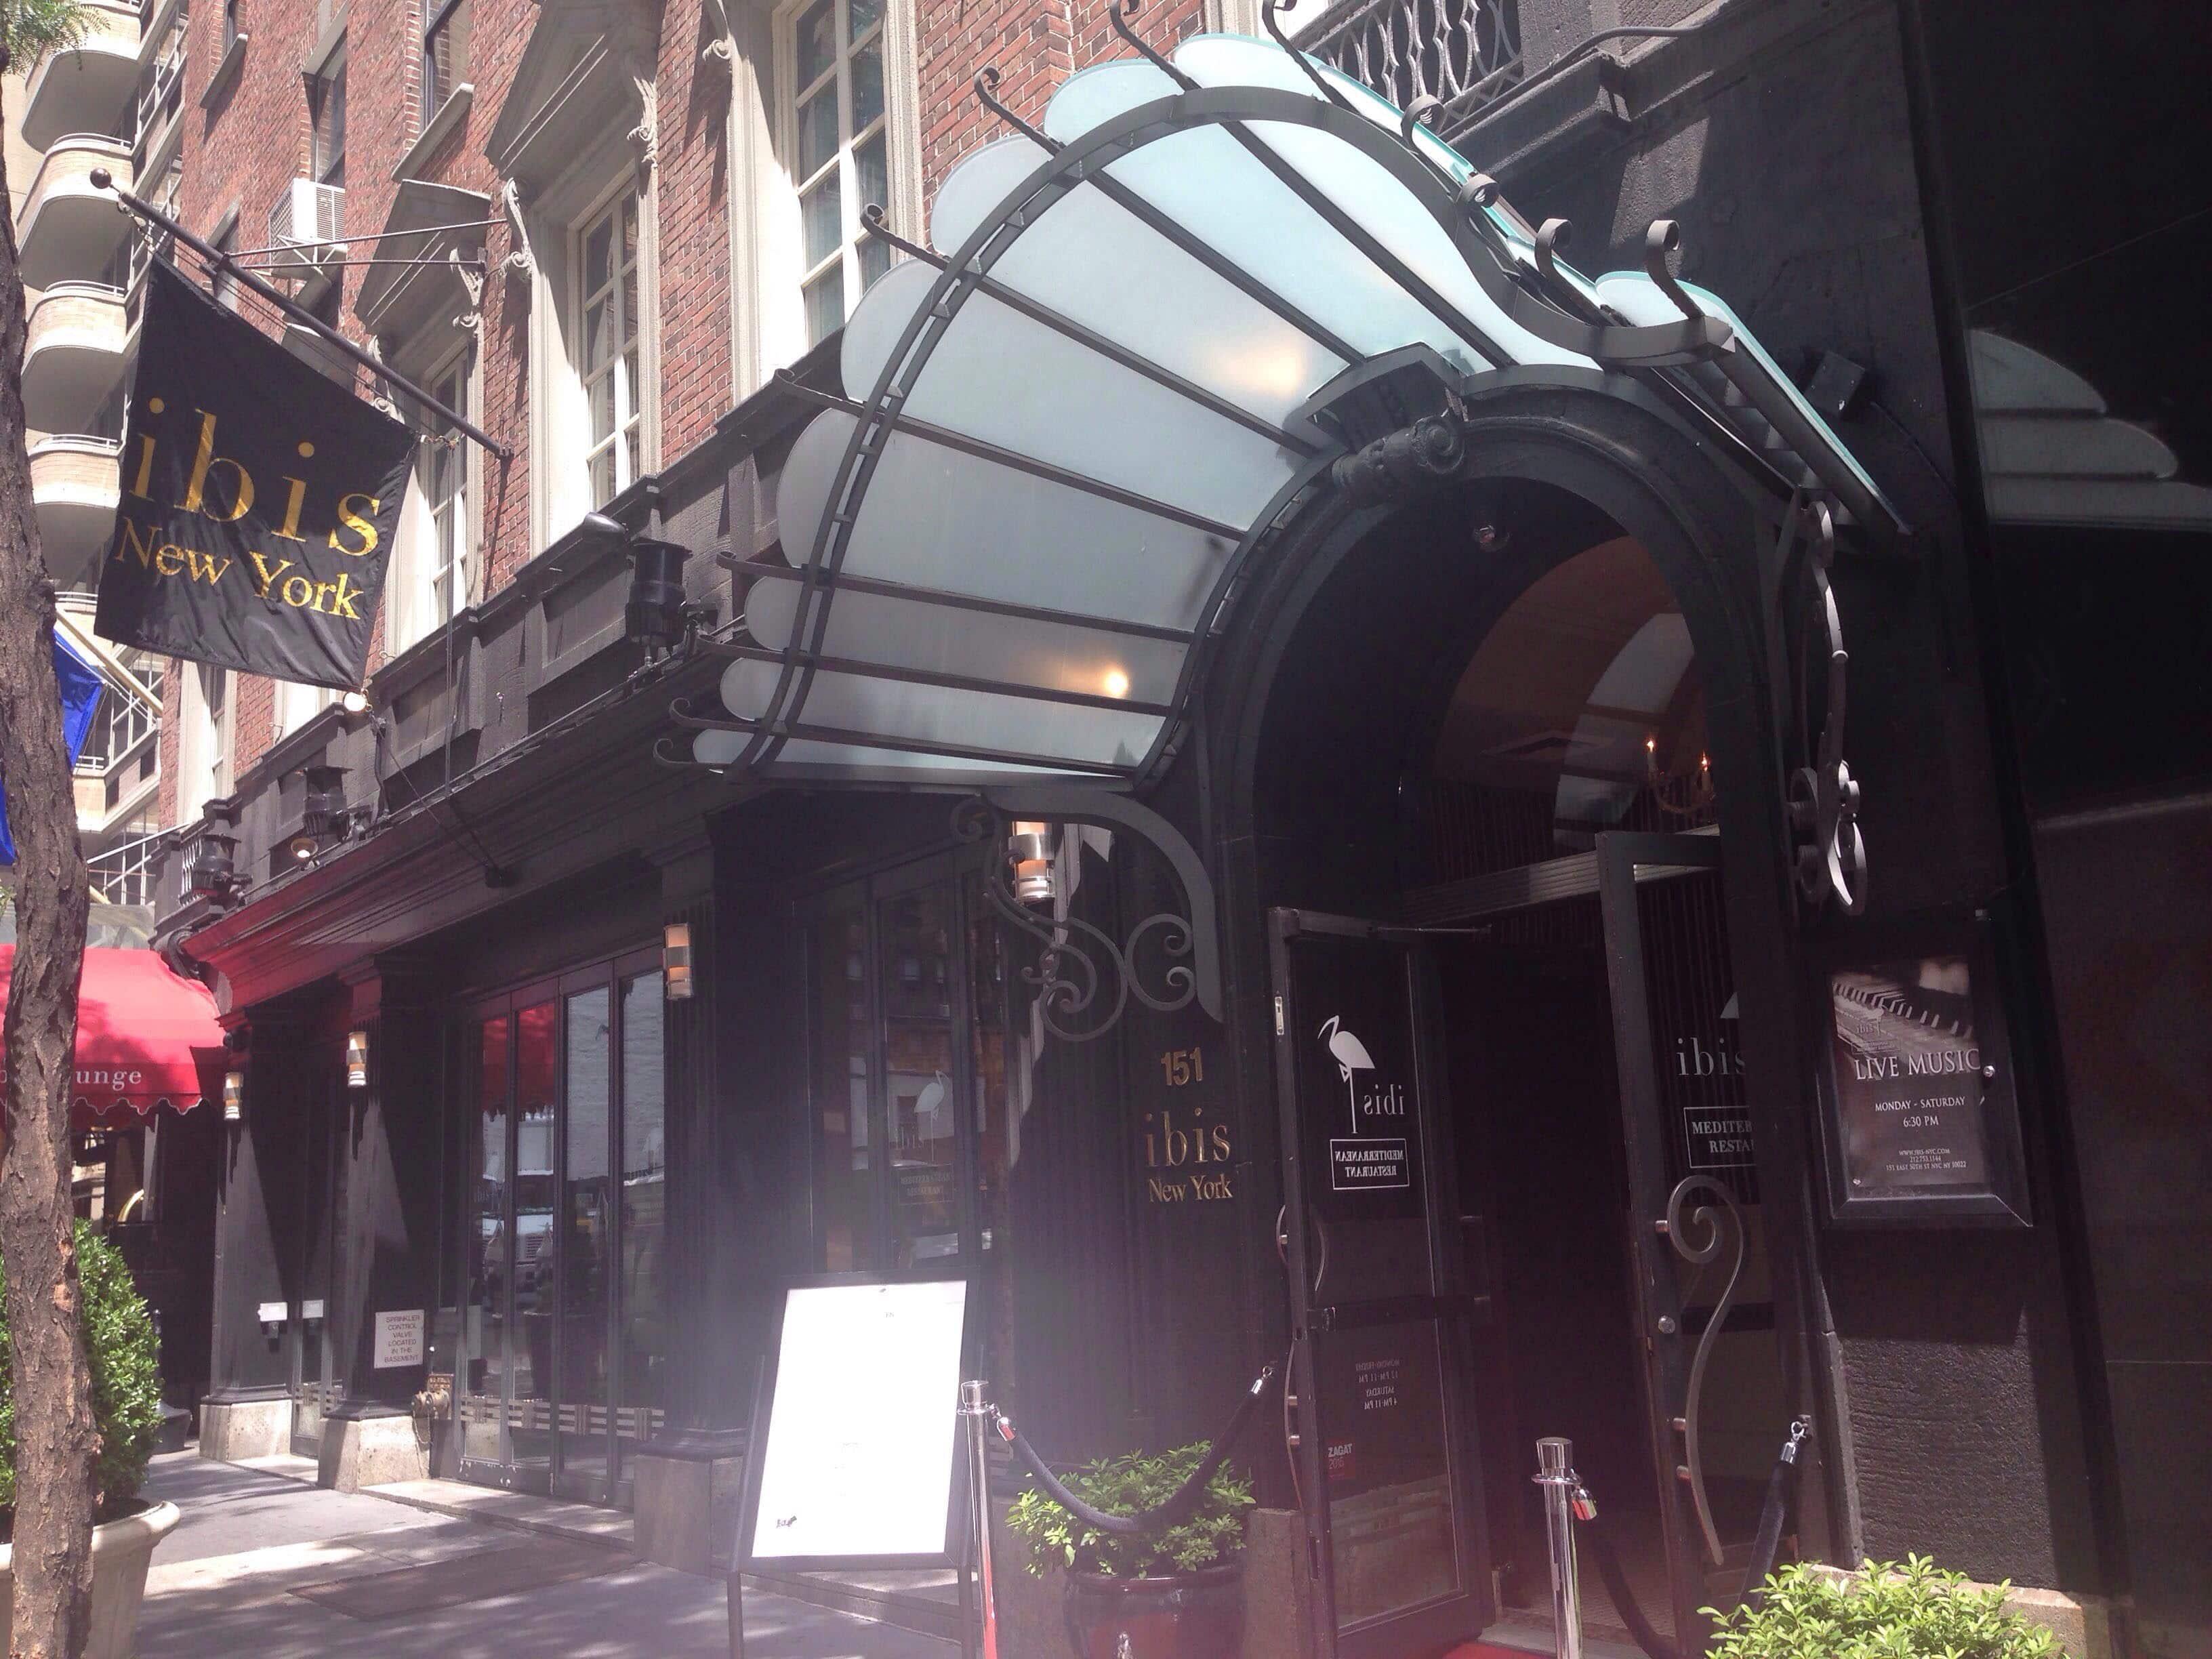 Ibis A New York ibis mediterranean restaurant - the kimberly hotel, new york